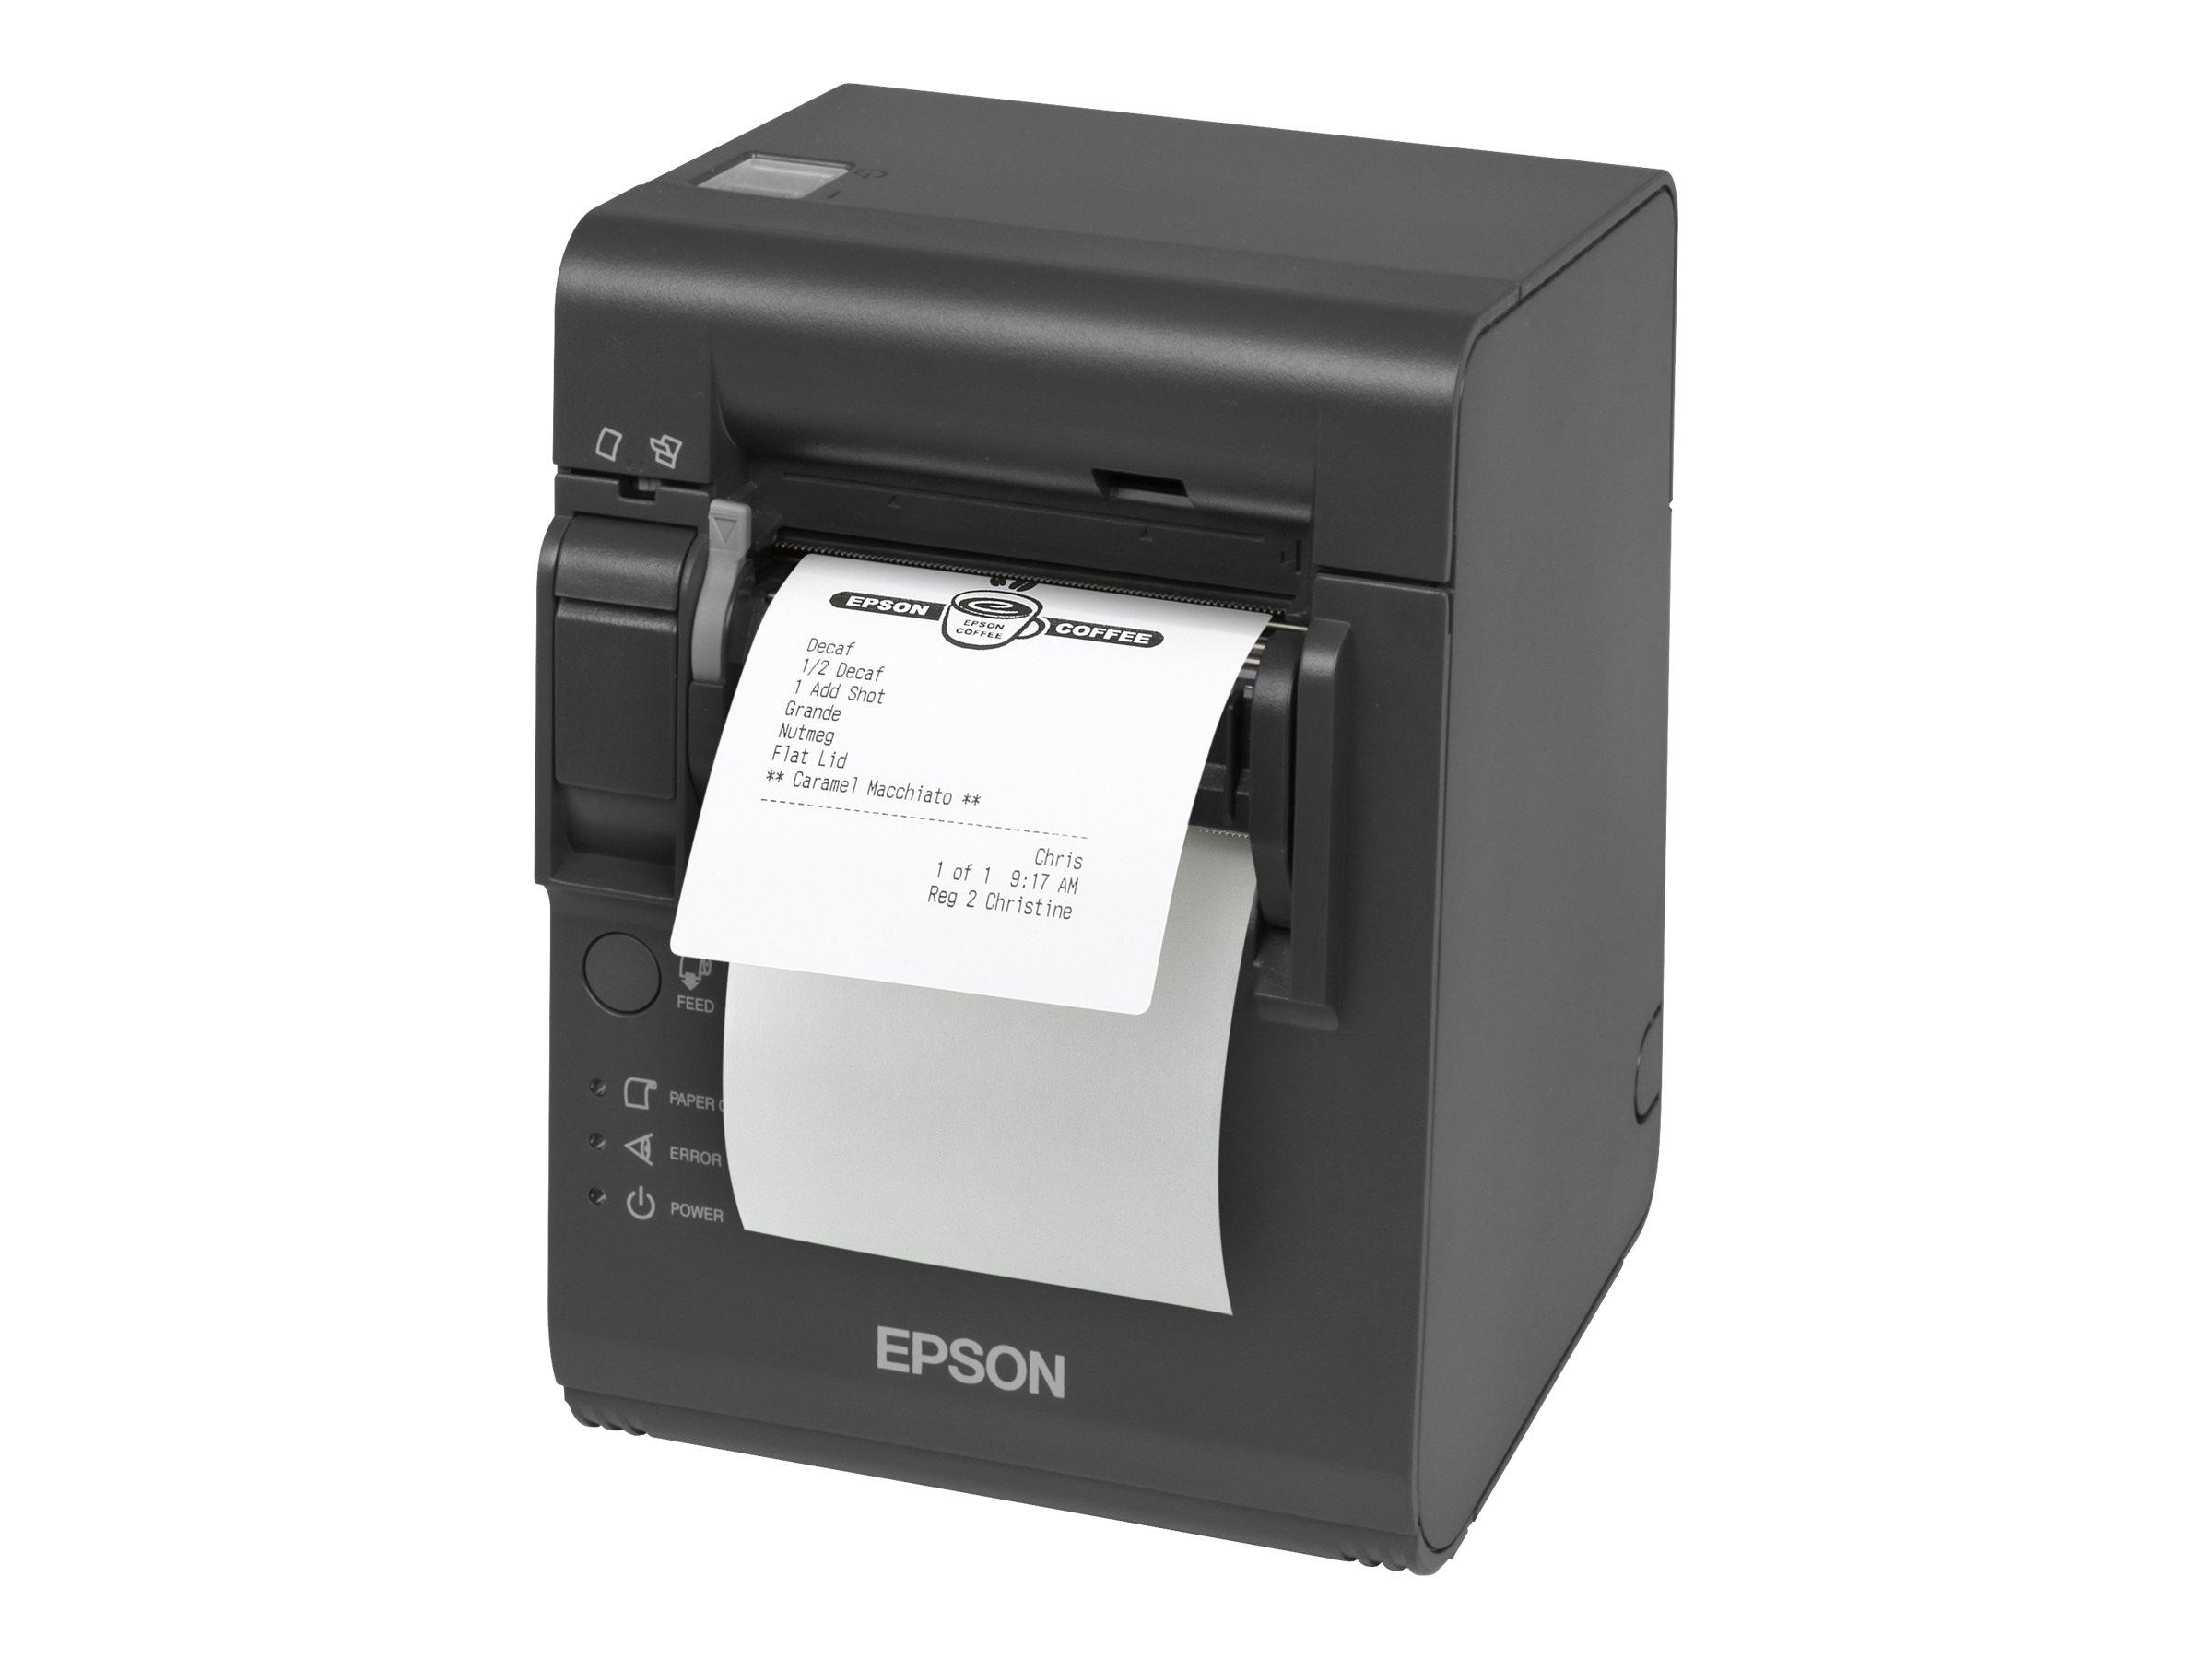 Epson TM L90 - Belegdrucker - Thermozeile - Rolle (7,95 cm)